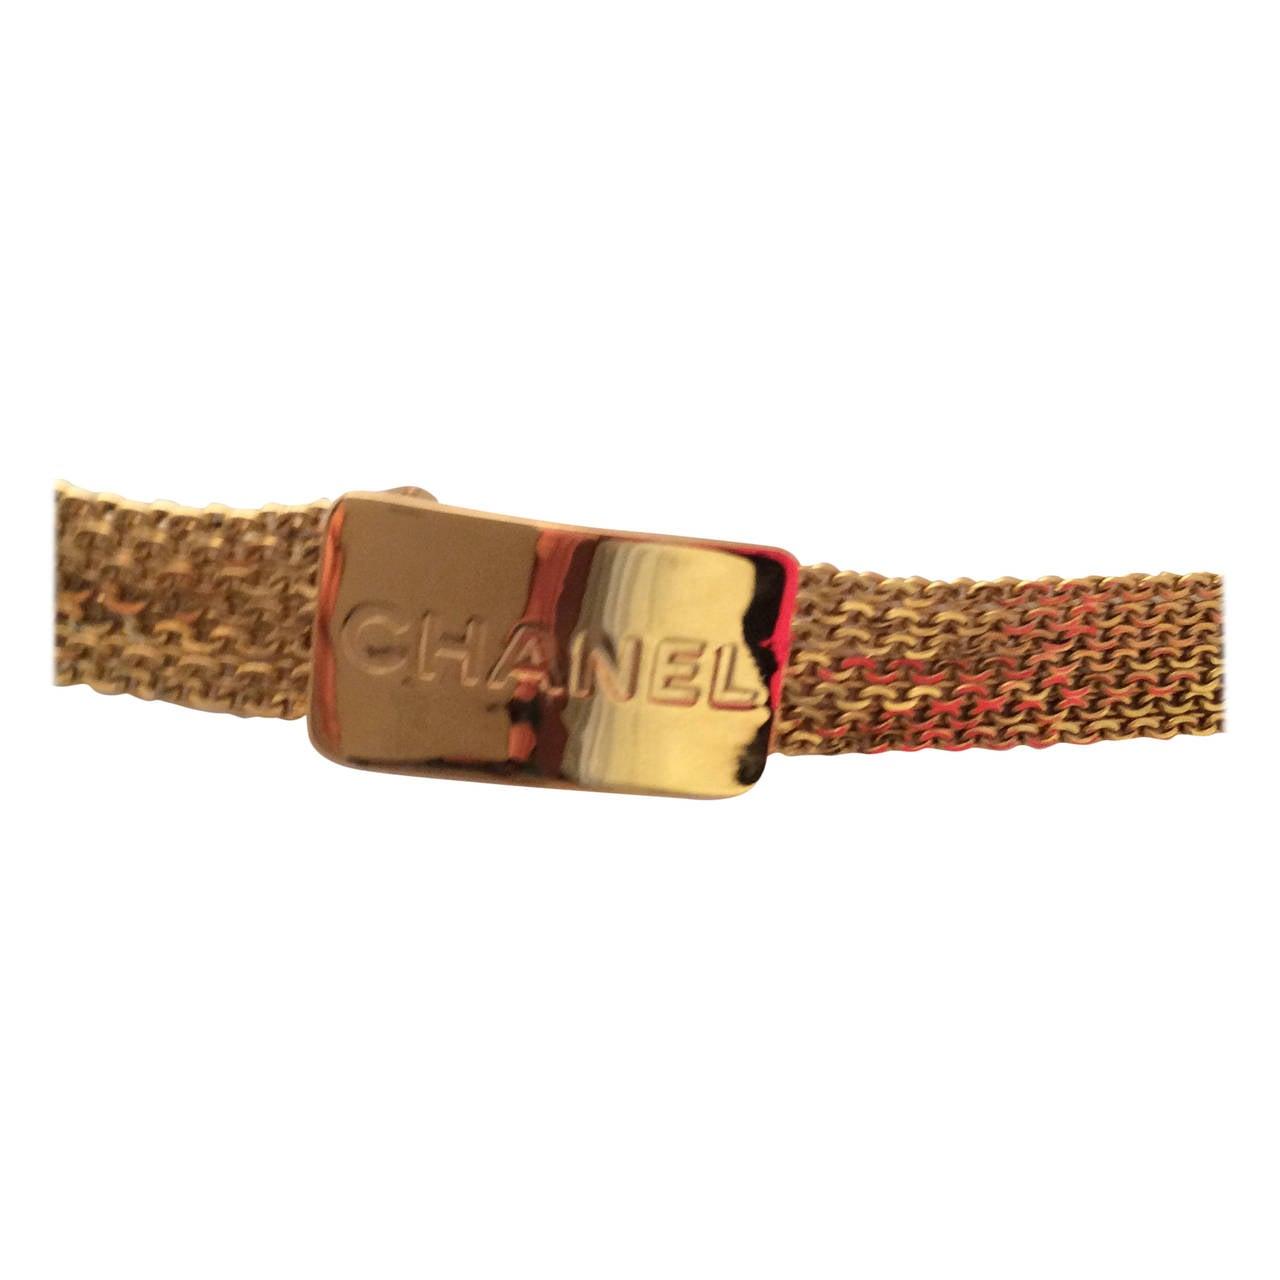 Vintage Gold Tone Magnificent Chain Belt For Sale